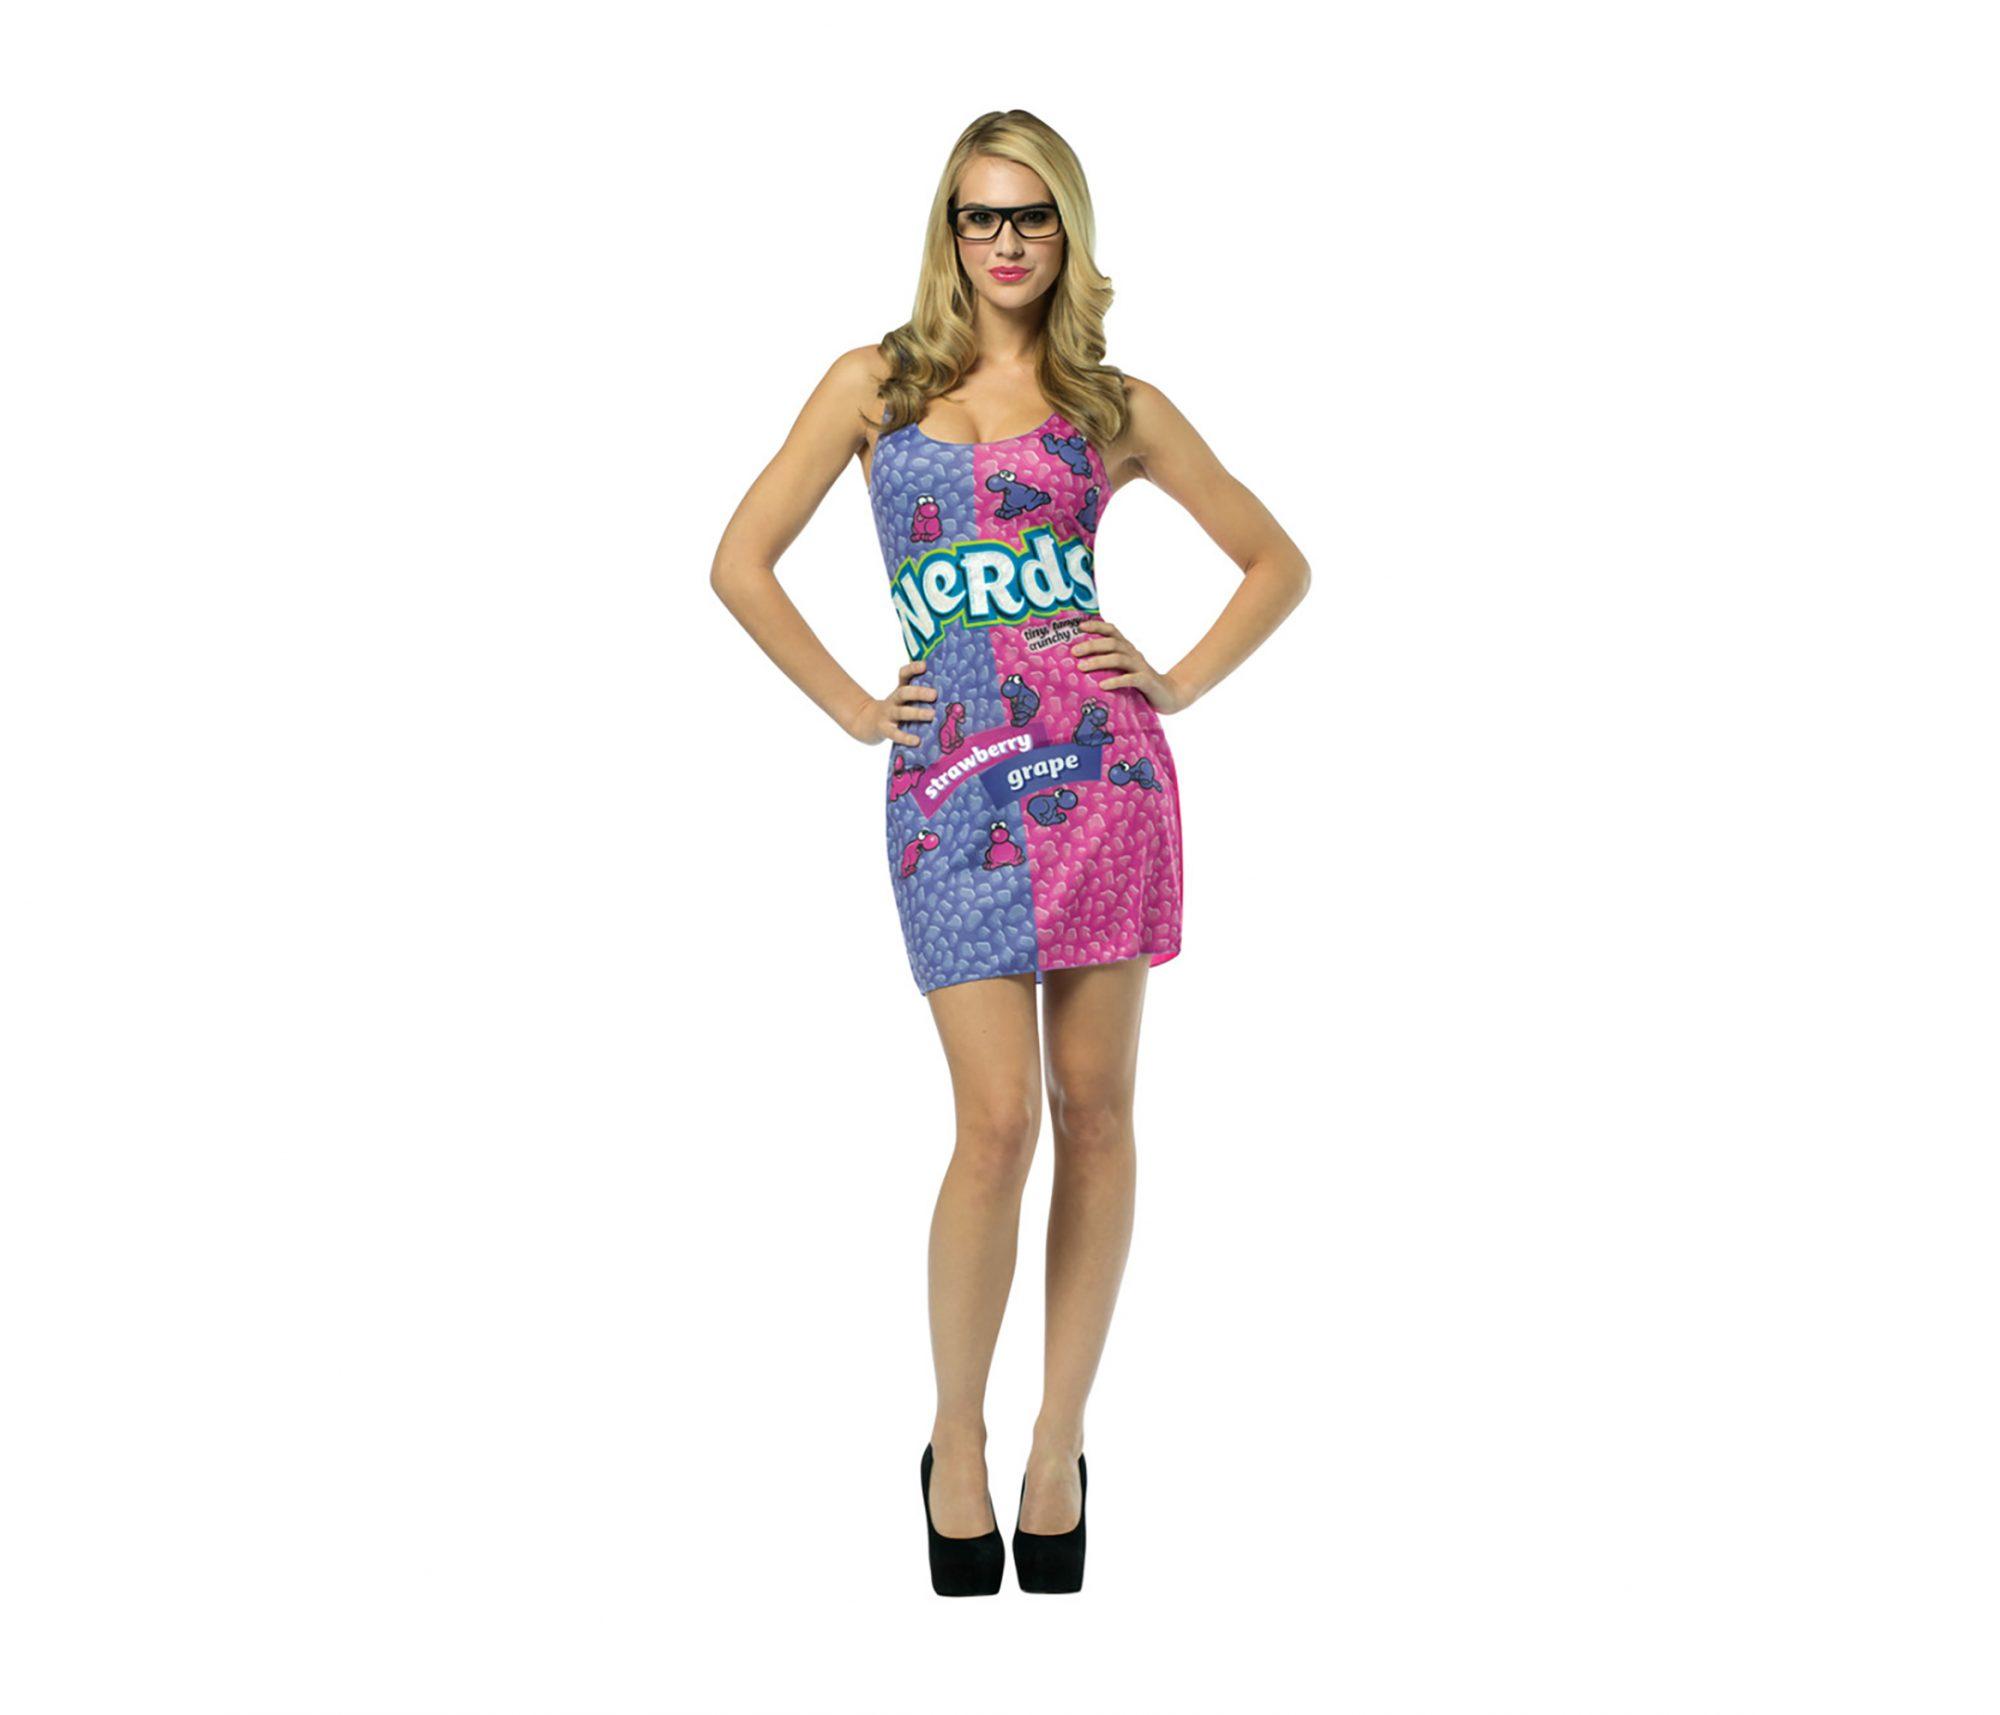 1709w-Grape-Nerds-Dress-Costume.jpg